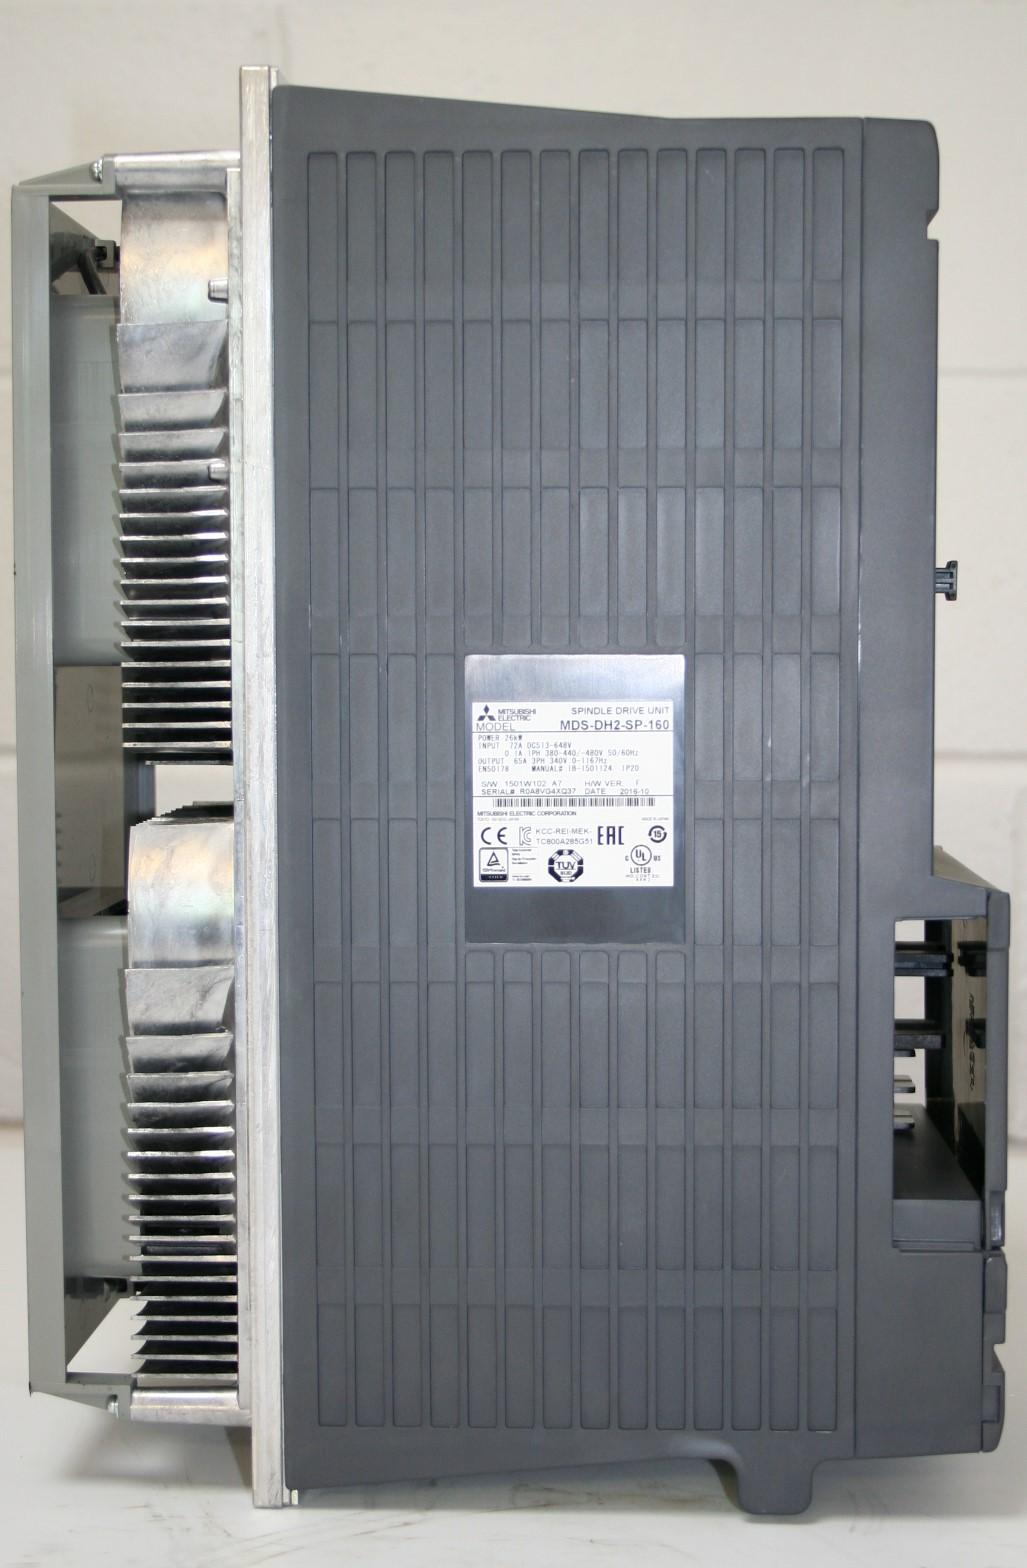 MDS DH2 SP 160 E